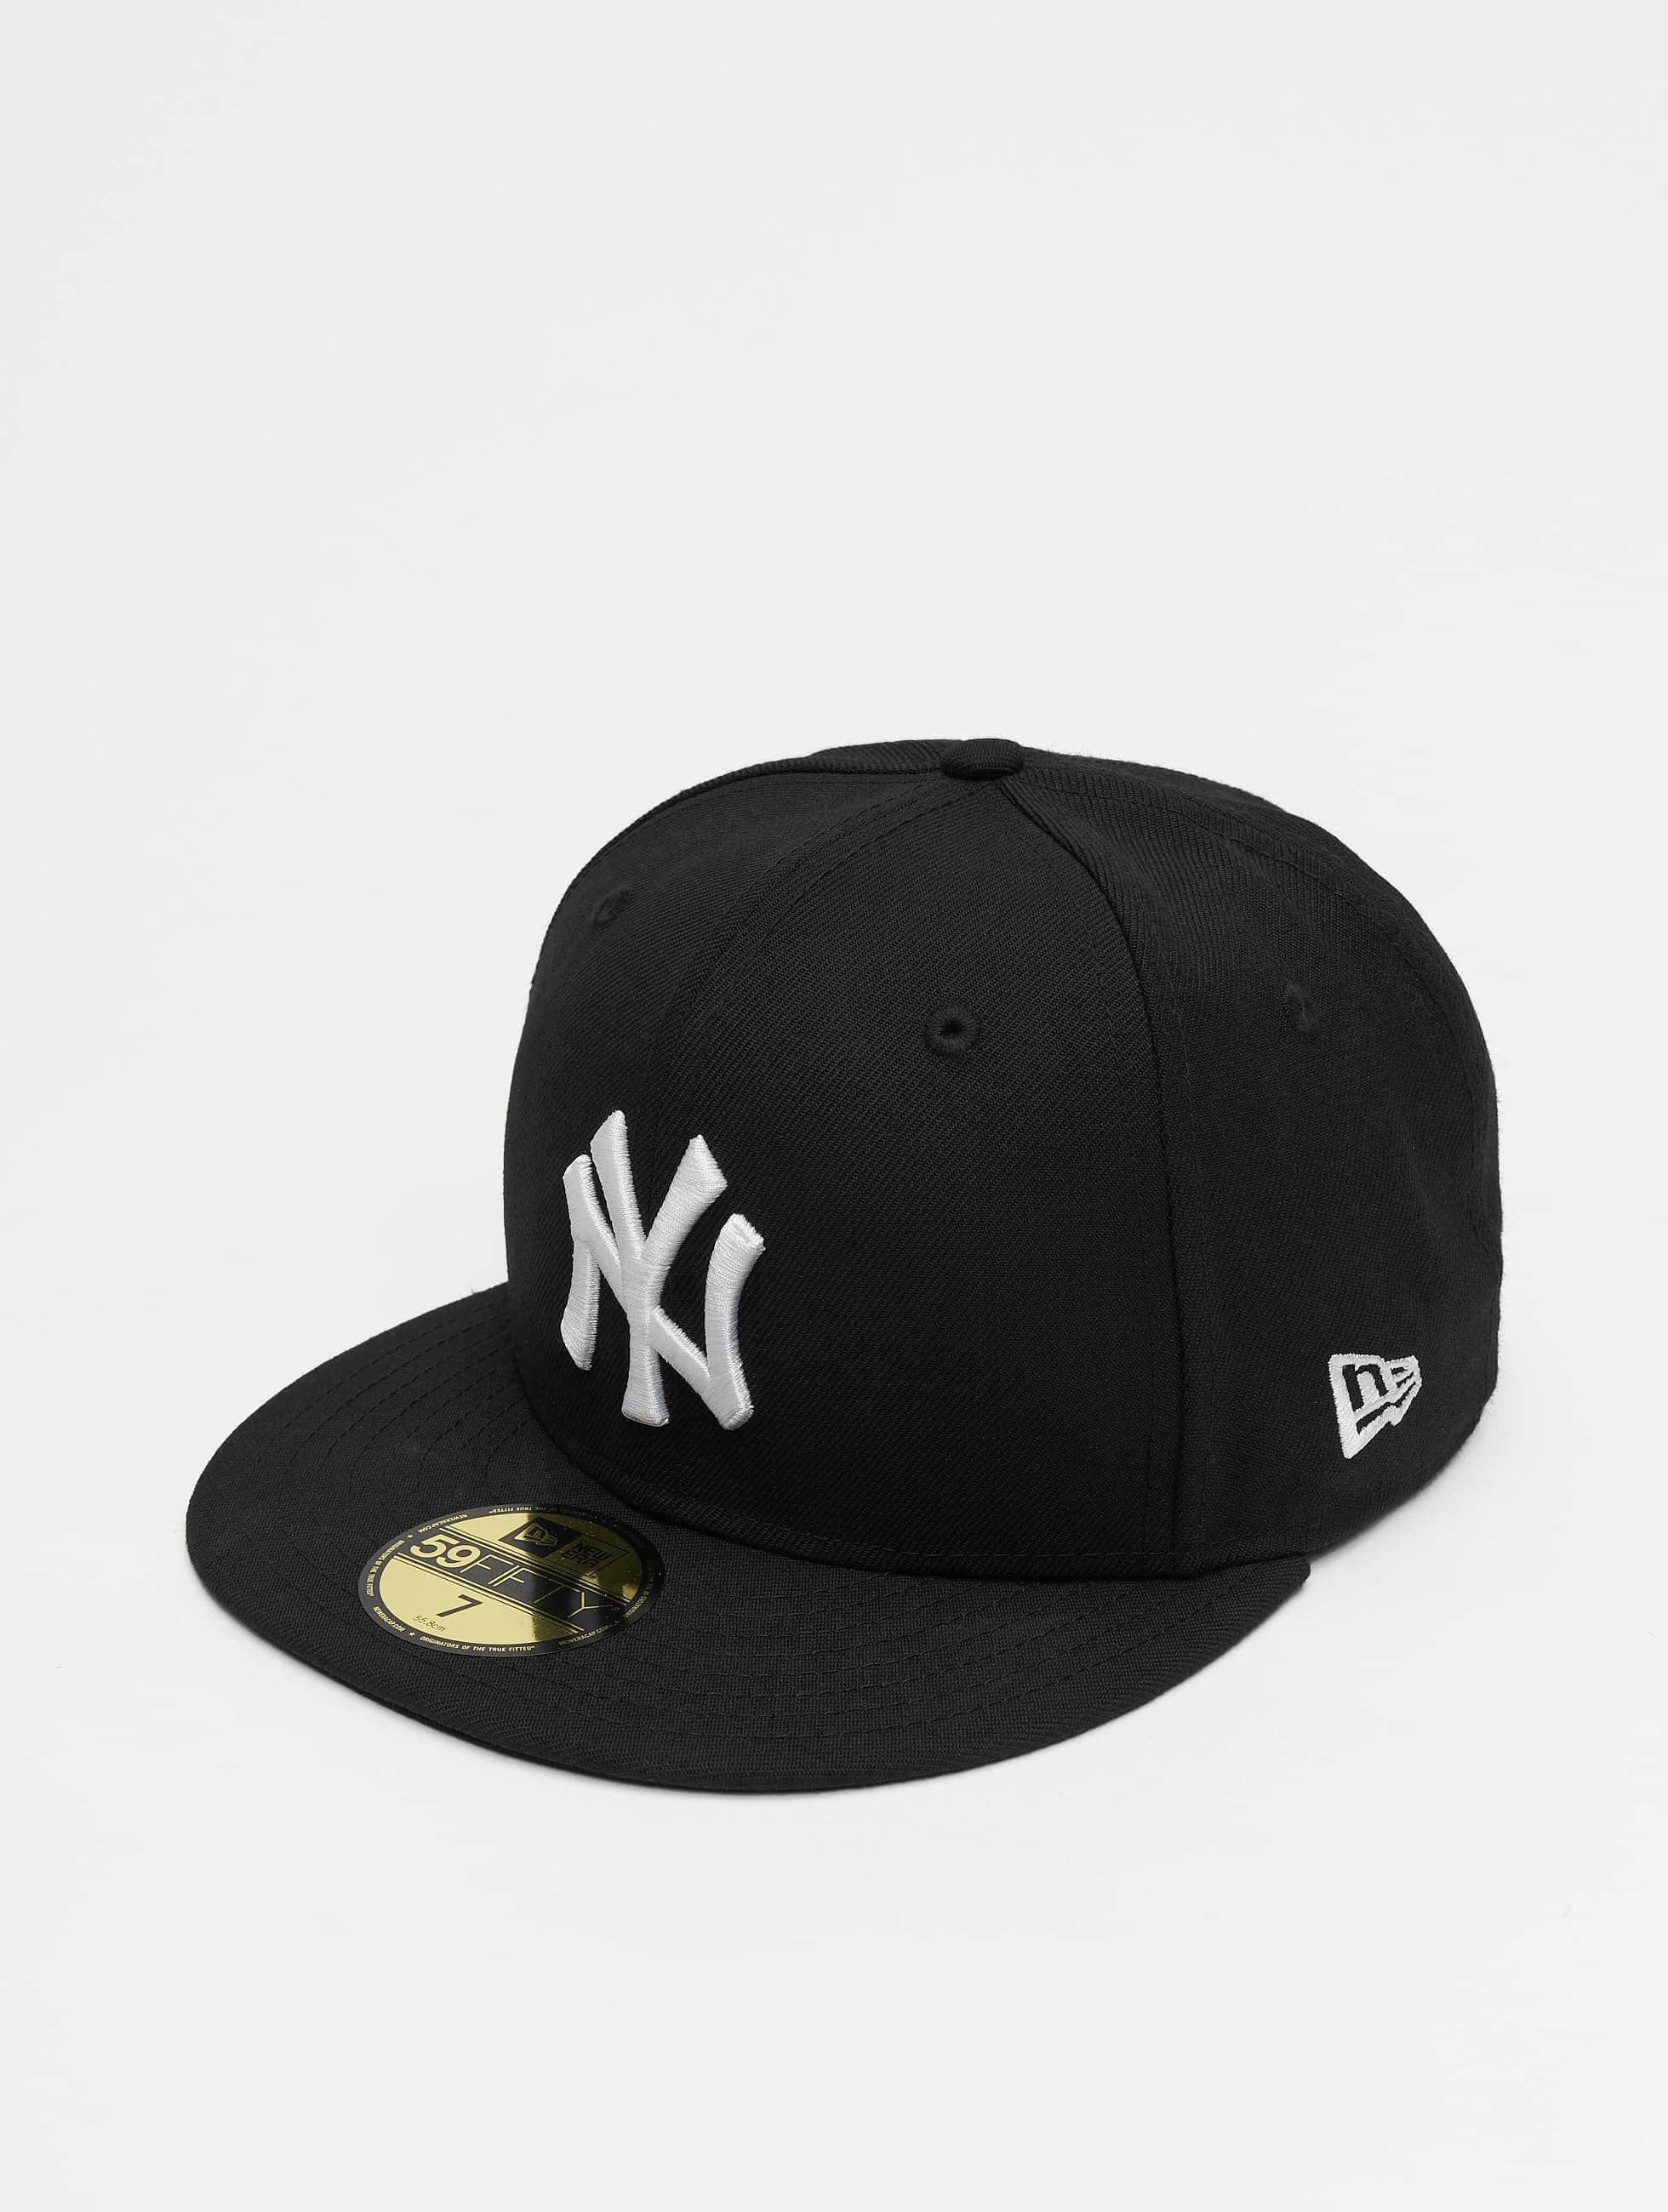 Yankees Gorras Planas